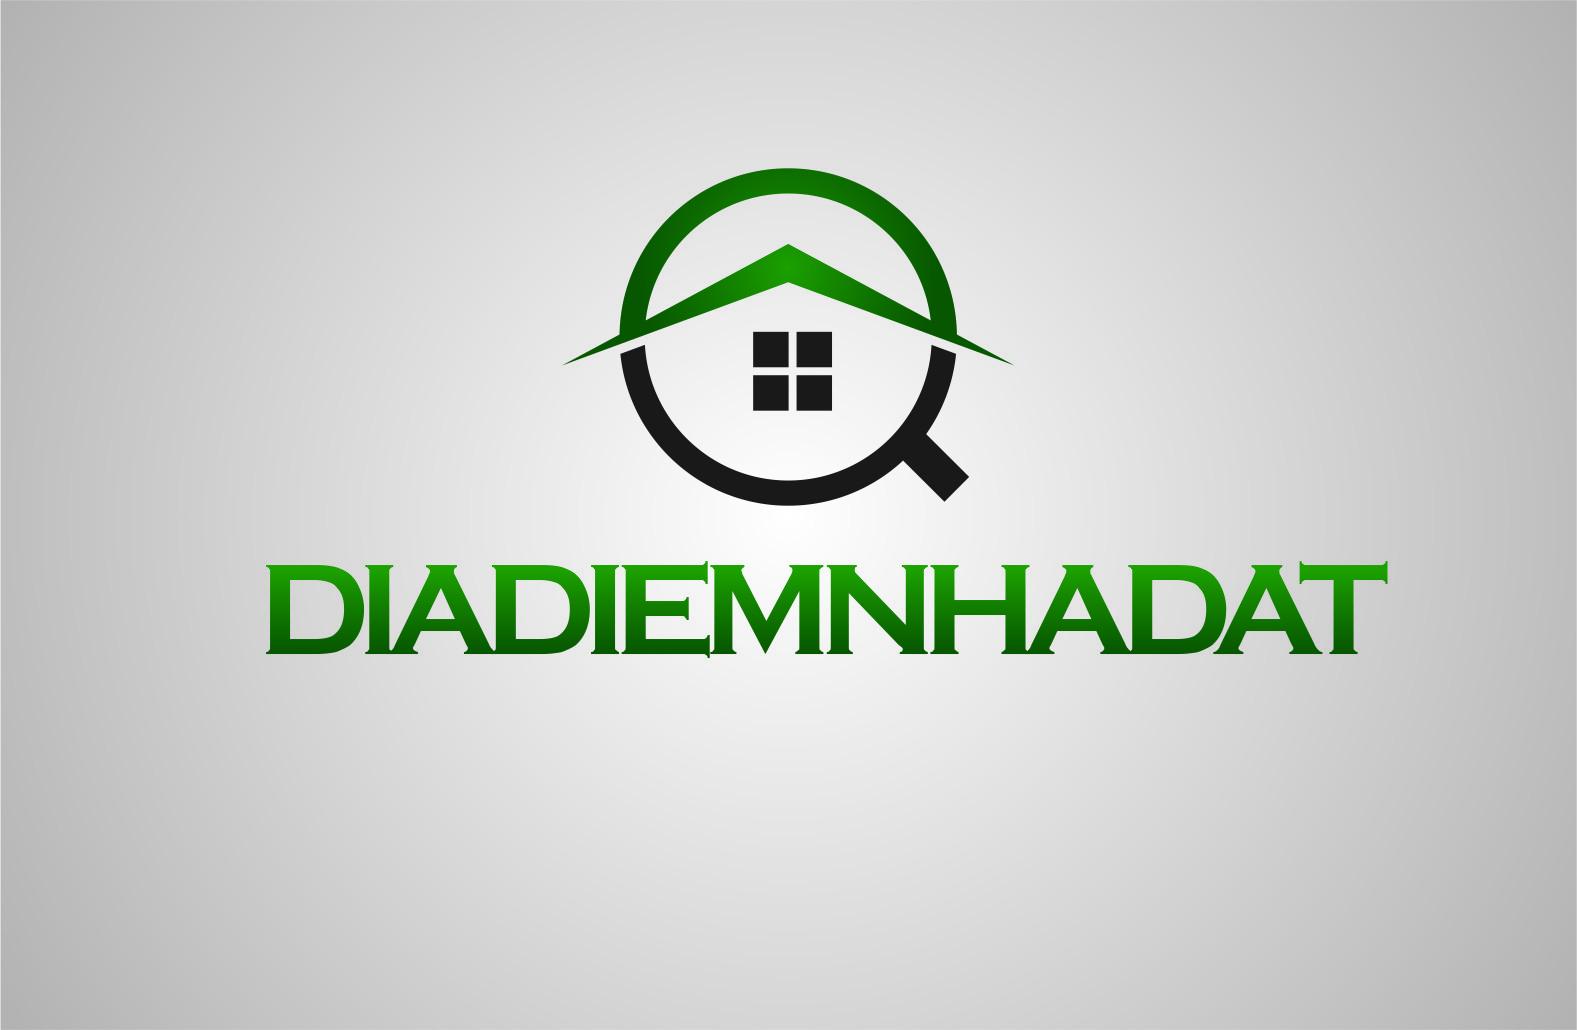 Logo Design by Yuda Hermawan - Entry No. 45 in the Logo Design Contest New Logo Design for DIADIEMNHADAT.